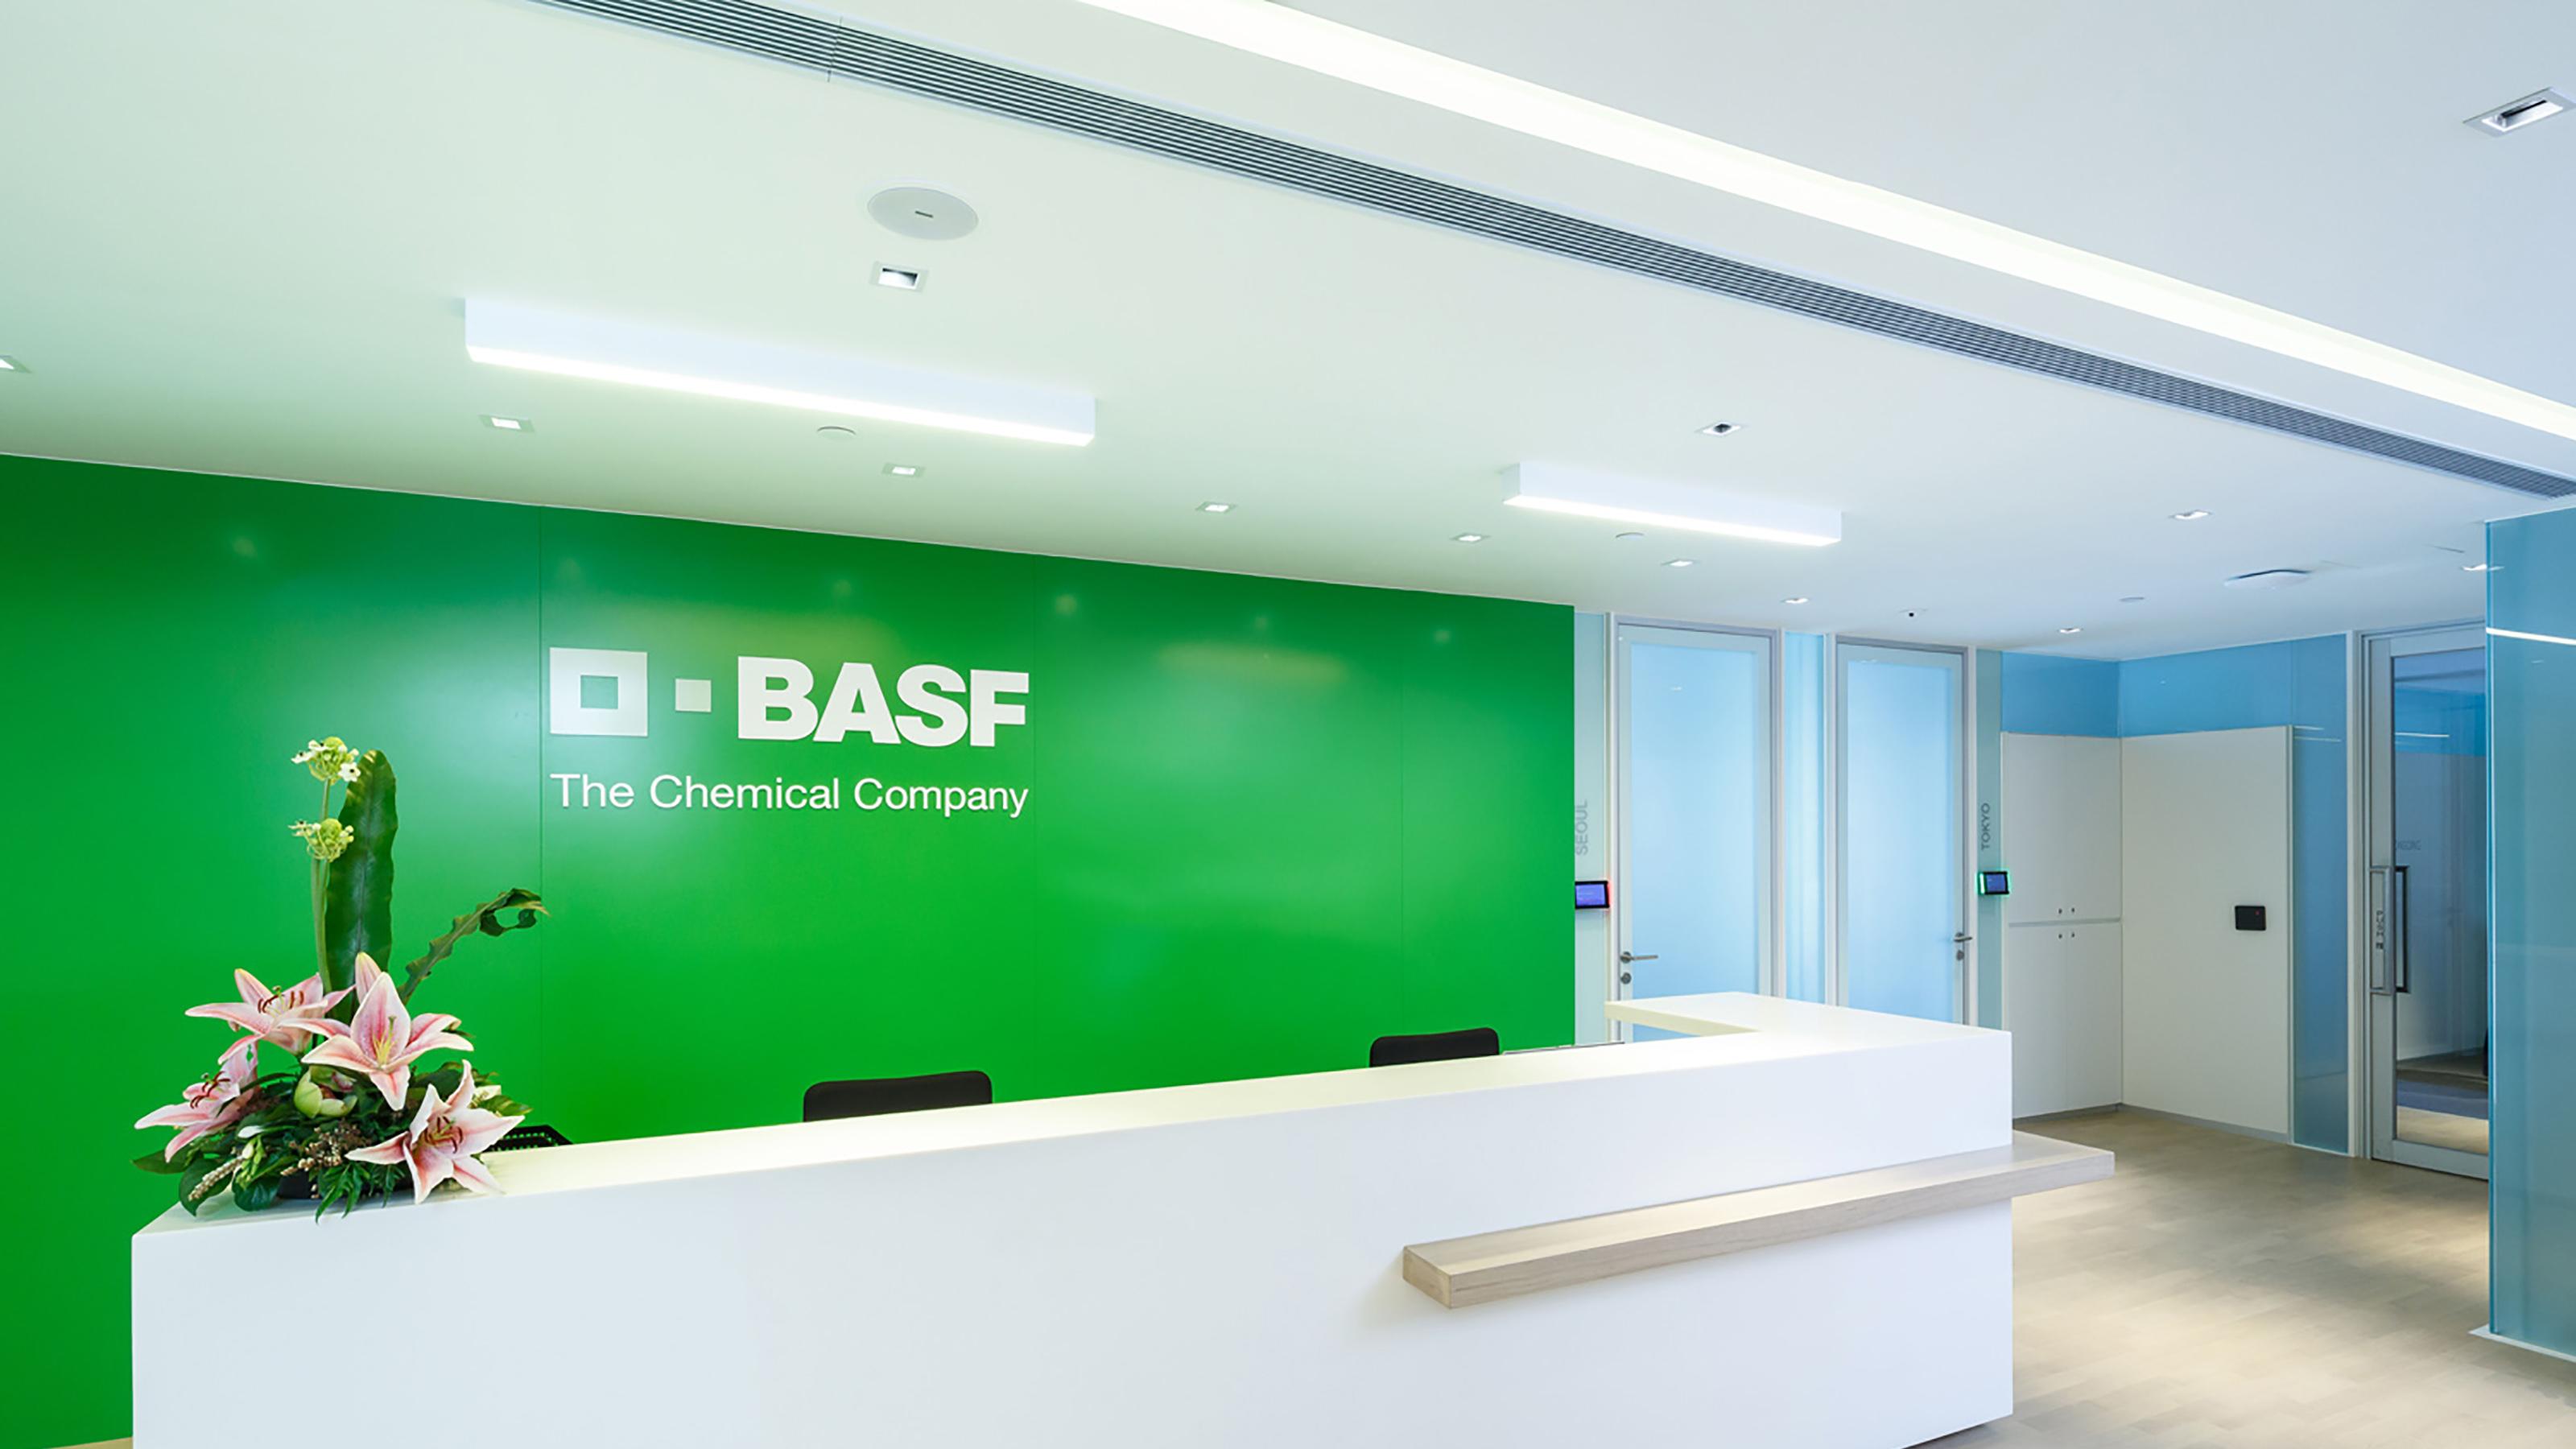 taqa corporate office interior. Taqa Corporate Office Interior. Interior H R